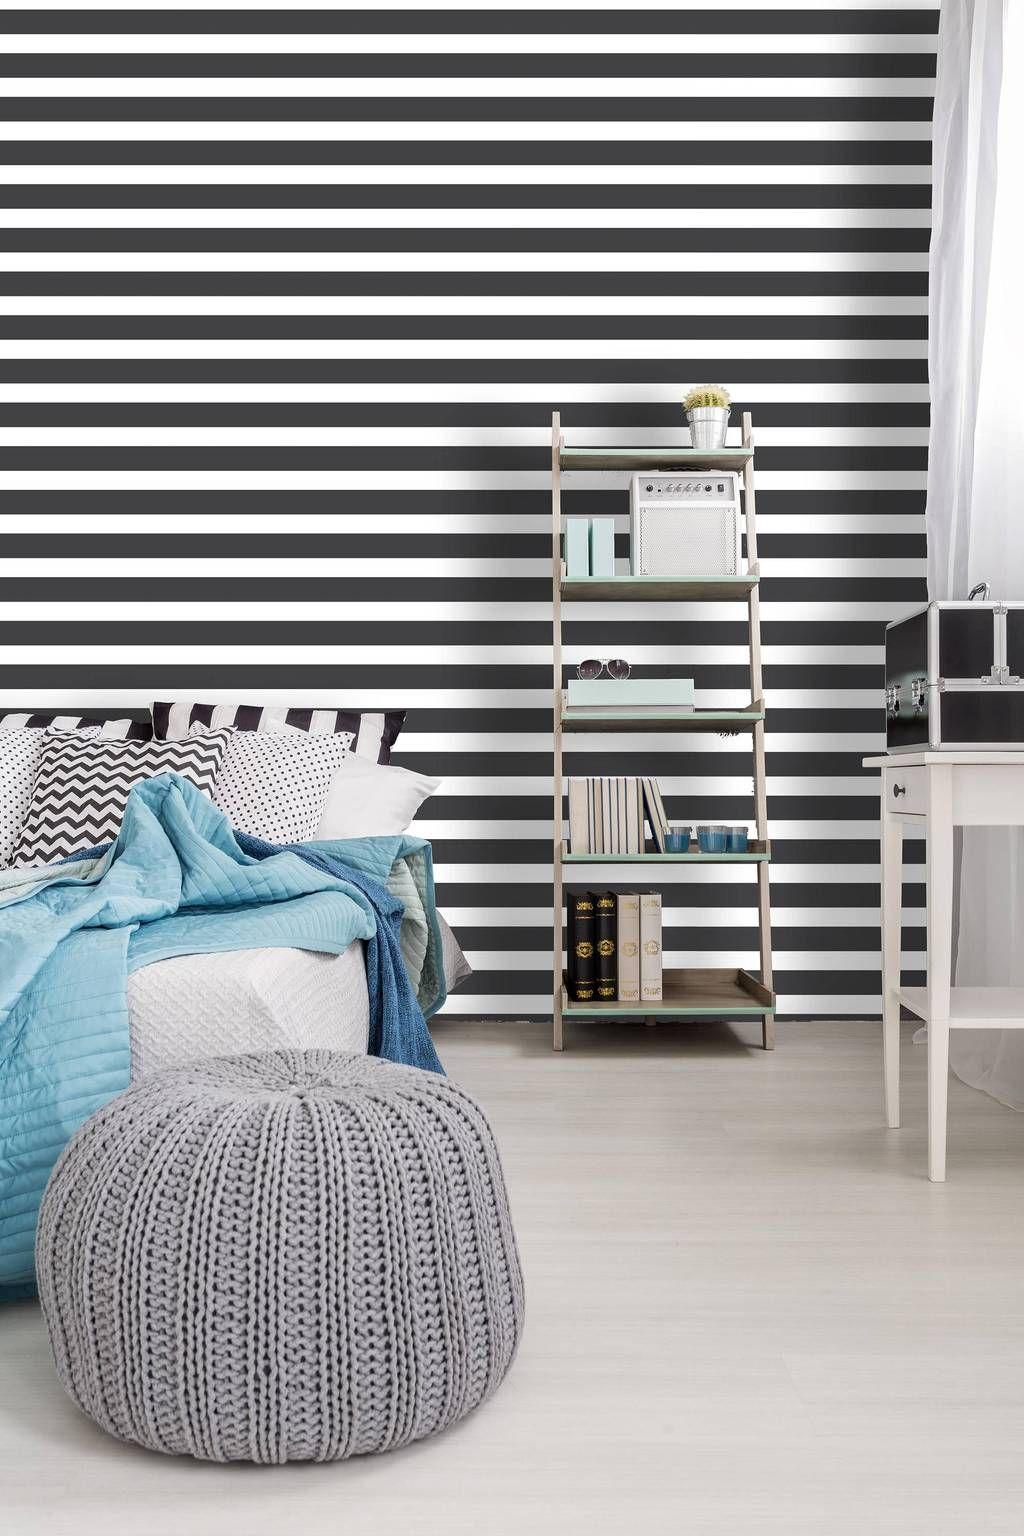 Geometric black and white removable wallpaper design